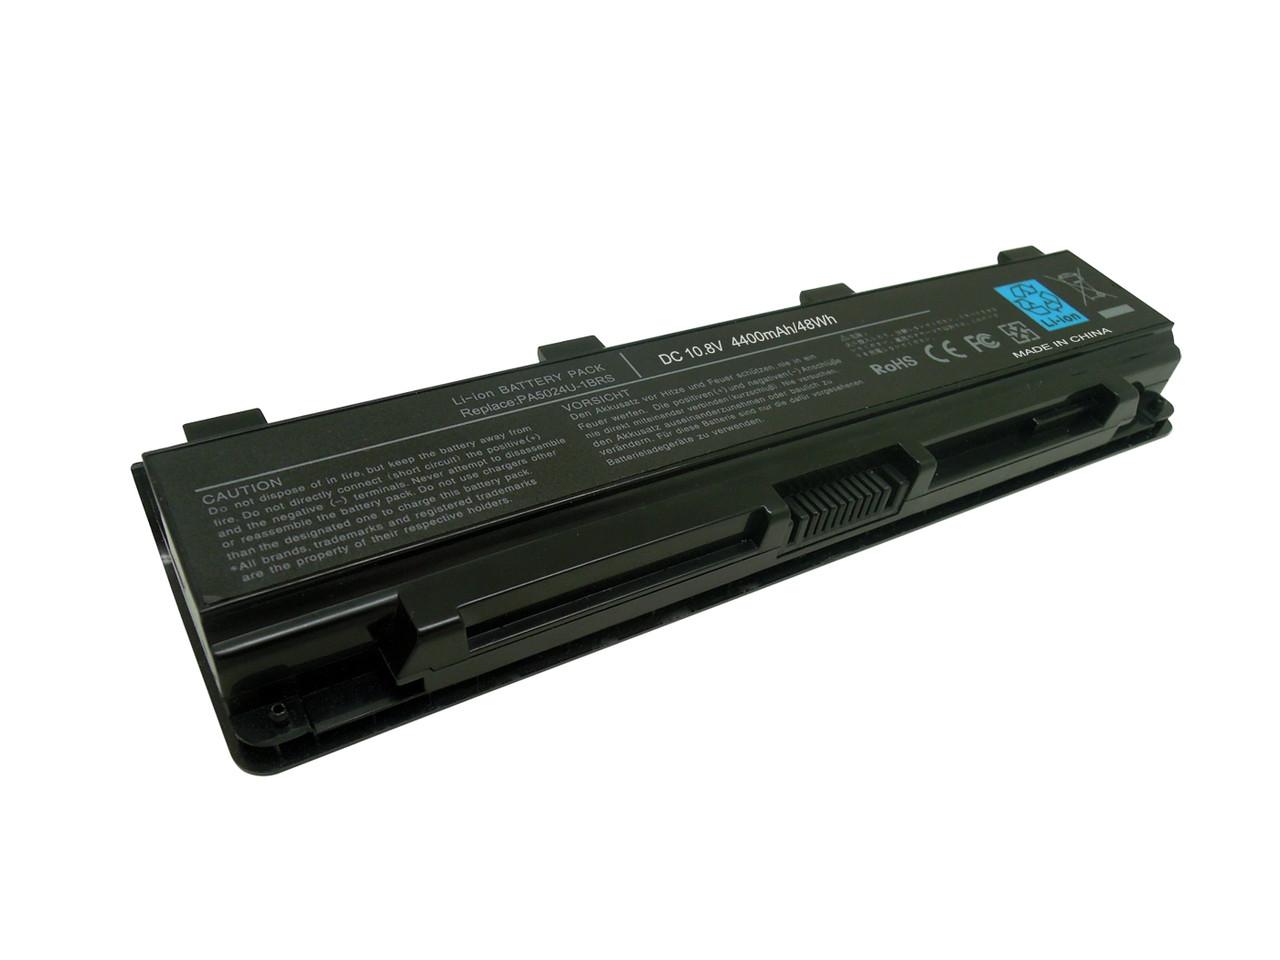 Батарея для ноутбука TOSHIBA SATELLITE S855-S5254